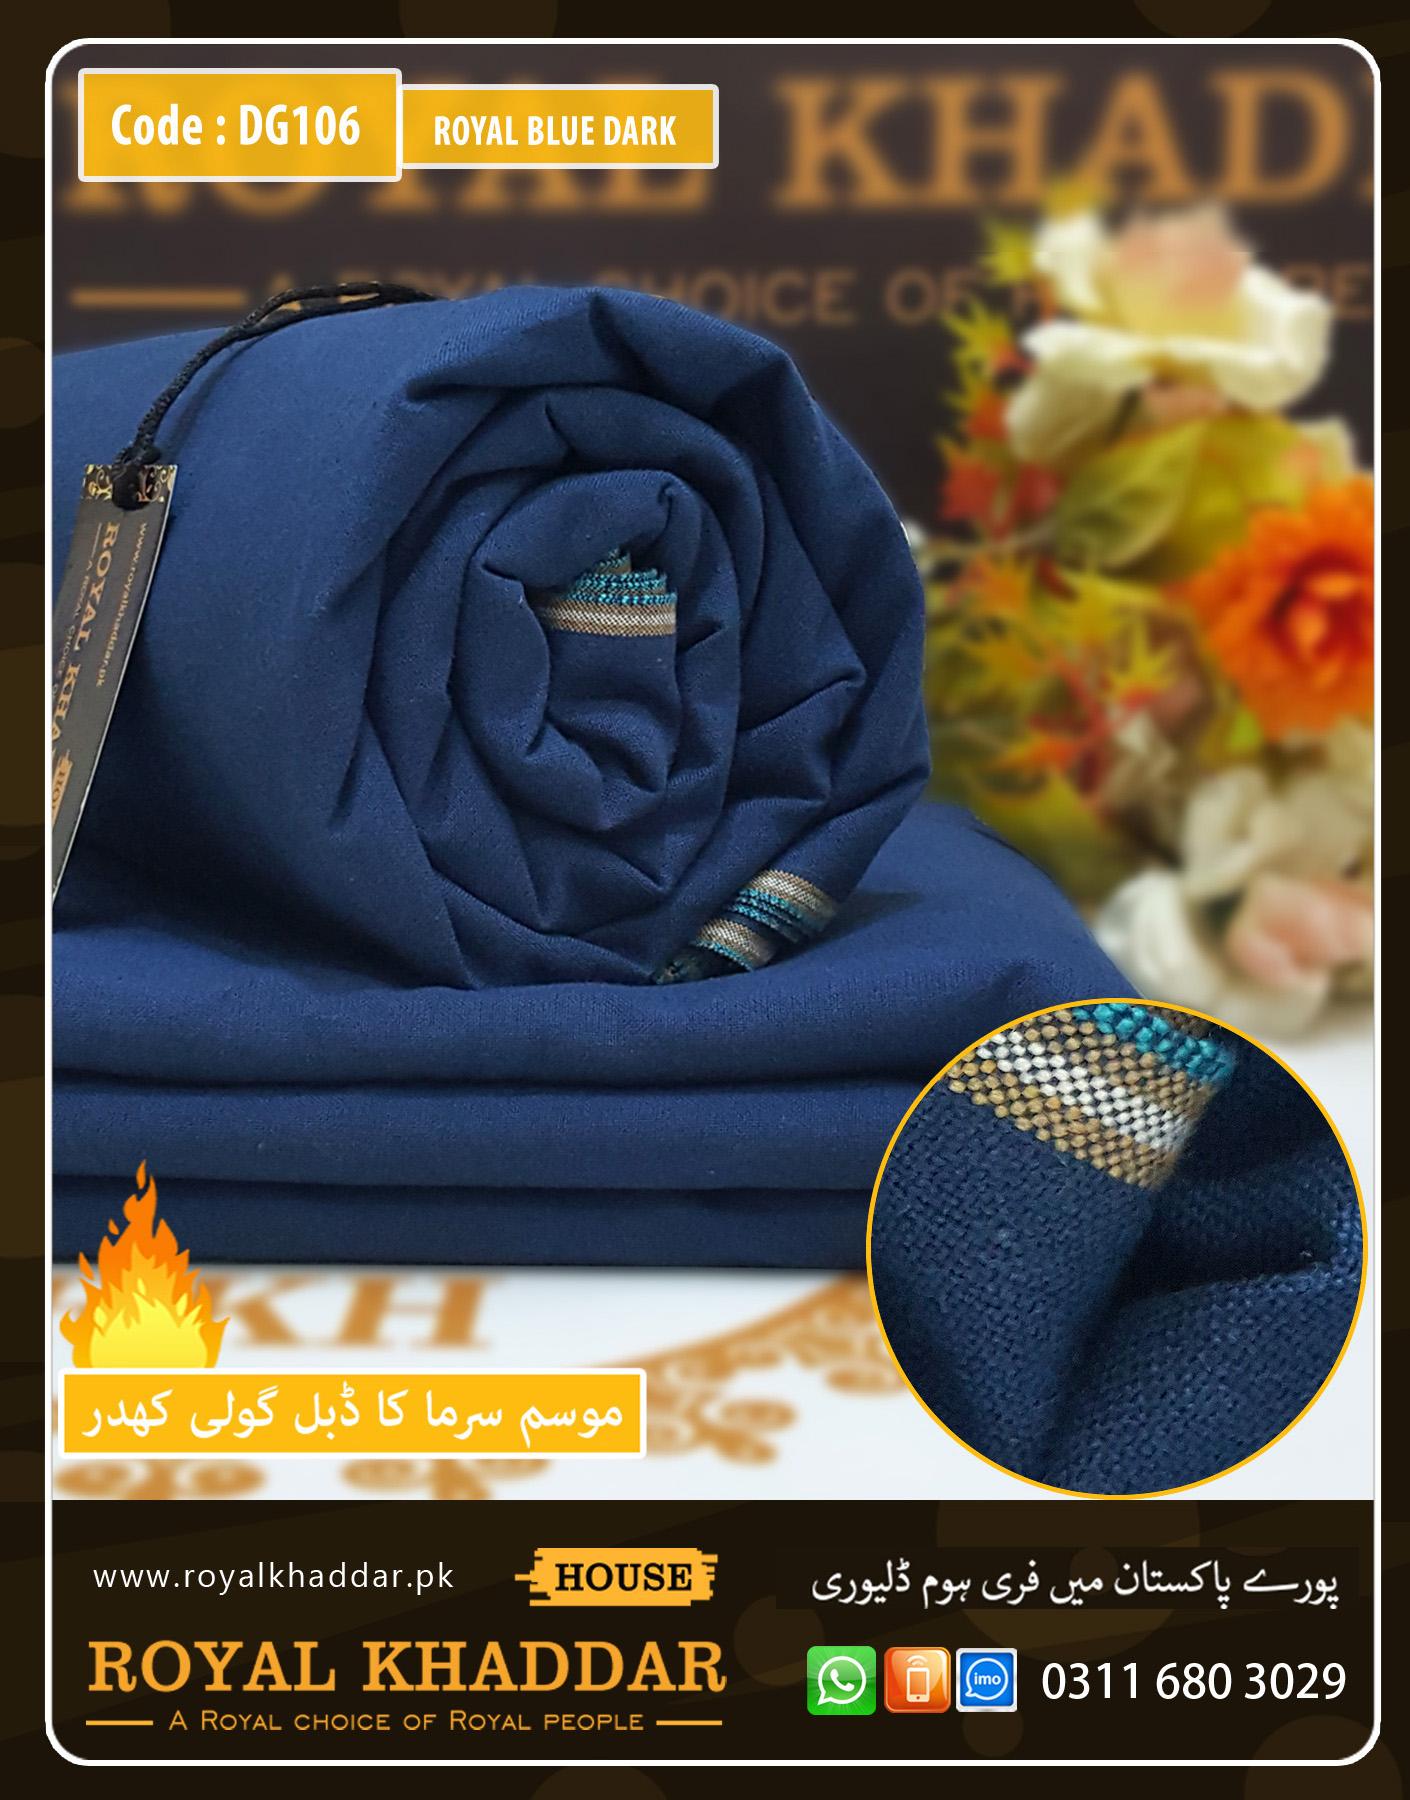 DG106 Royal Blue Dark Goli Winter Khaddar